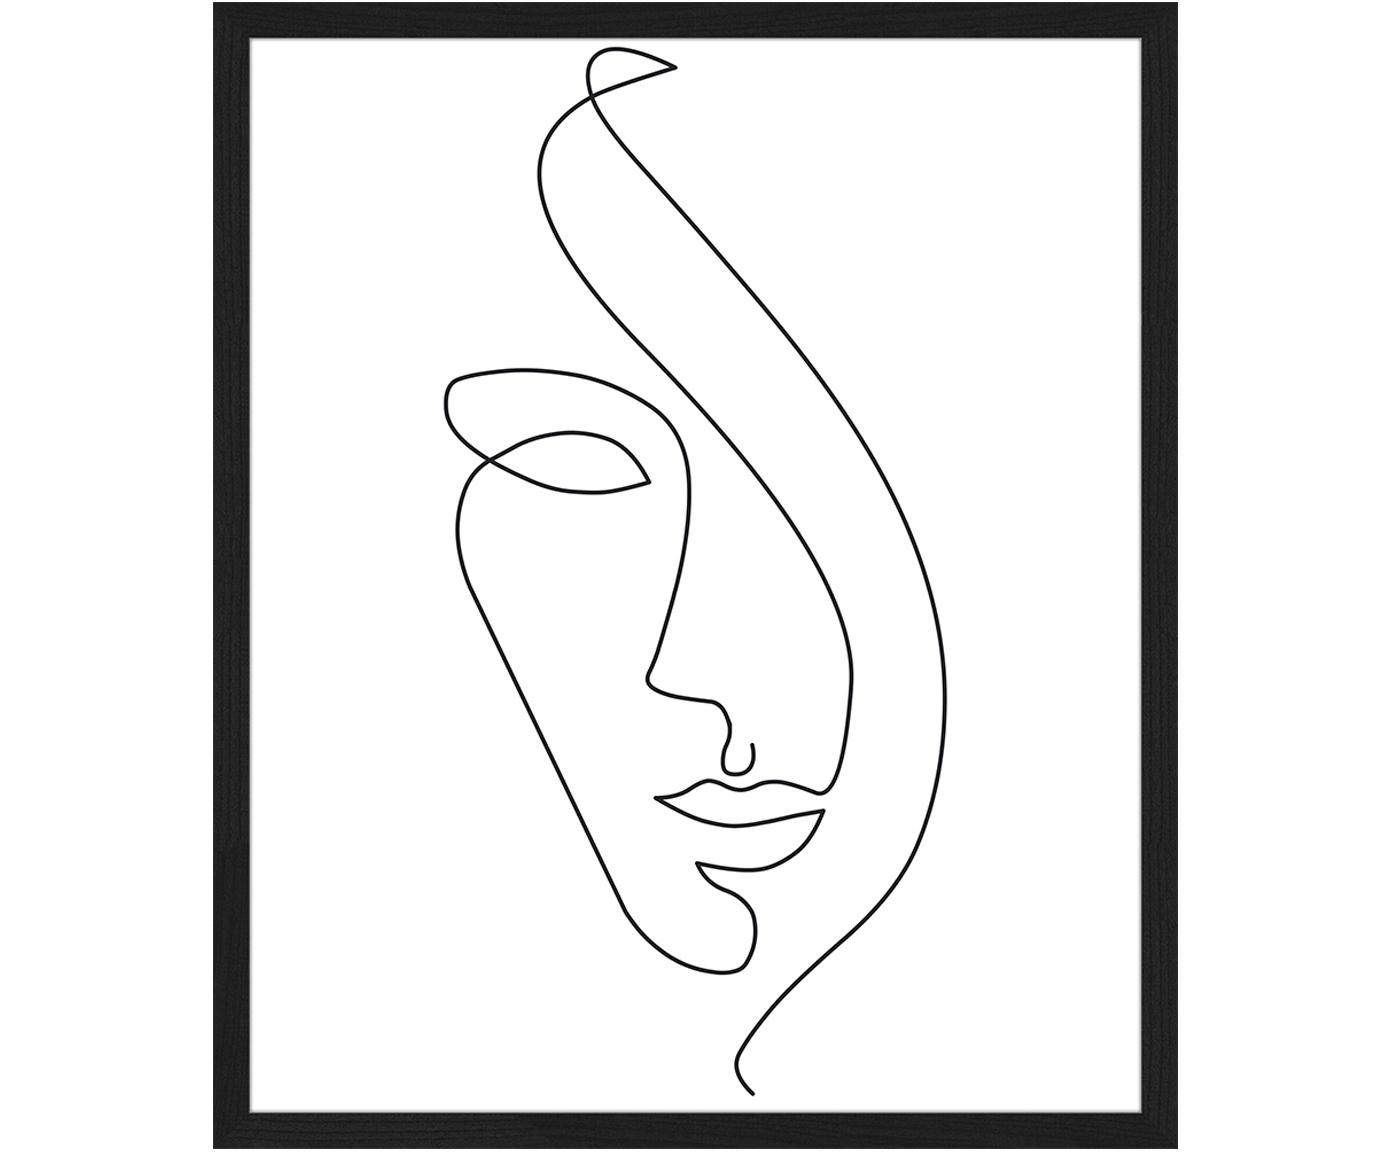 Gerahmter Digitaldruck Abstract Face, Rahmen: Buchenholz, lackiert, Front: Plexiglas, Bild: Digitaldruck auf Papier, , Rahmen: Schwarz, 53 x 63 cm